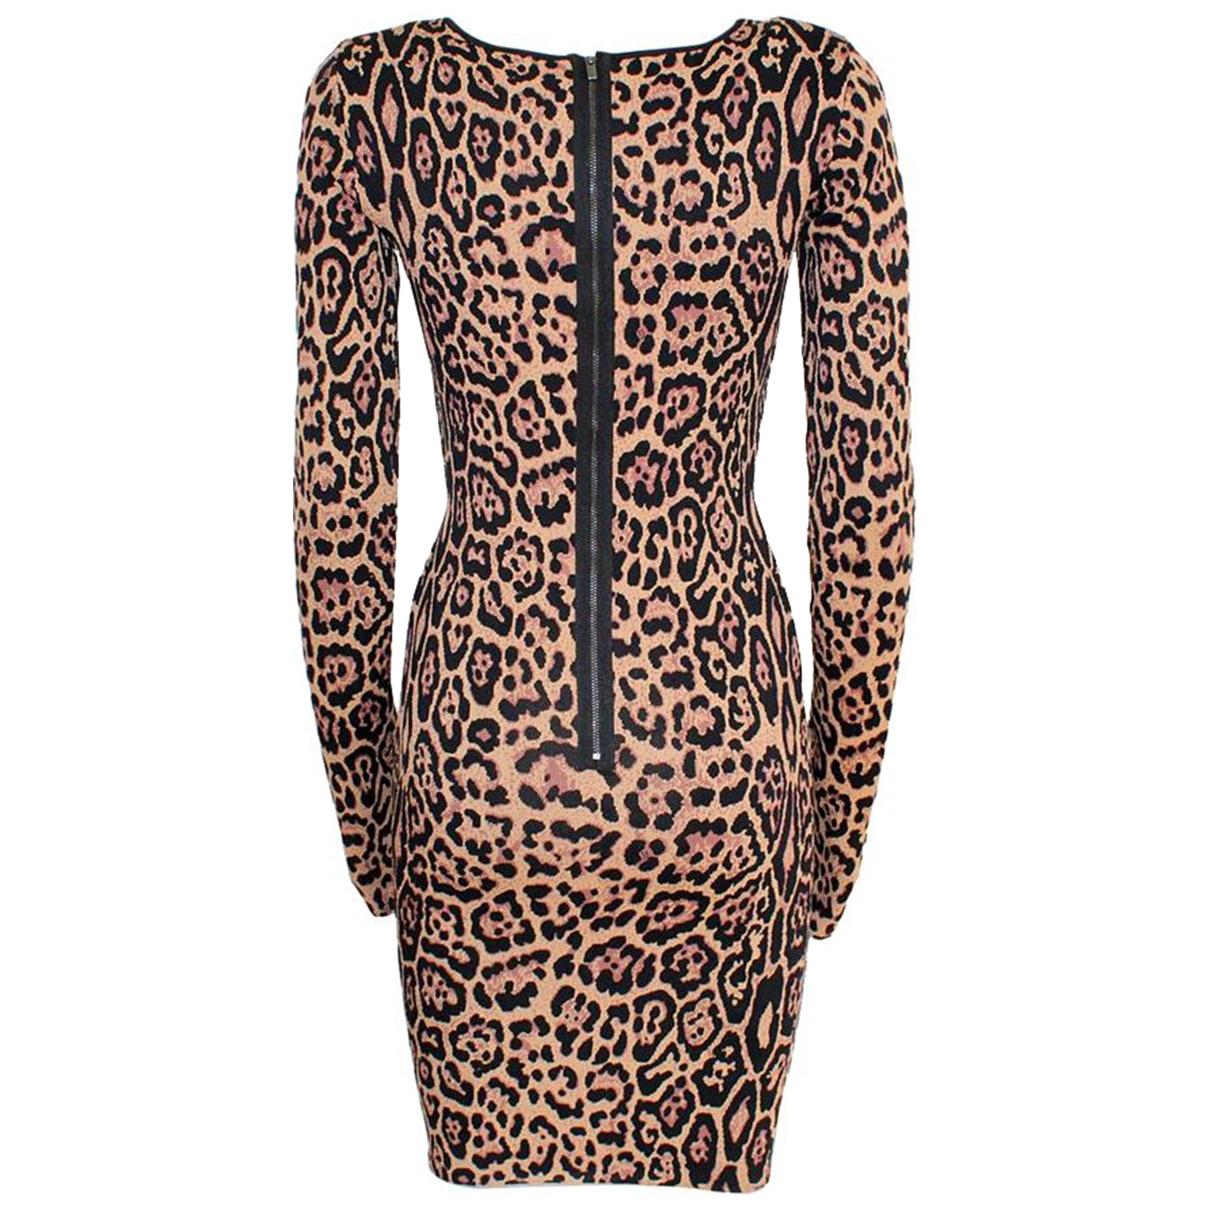 Bcbg Max Azria - Robe   pour femme en coton